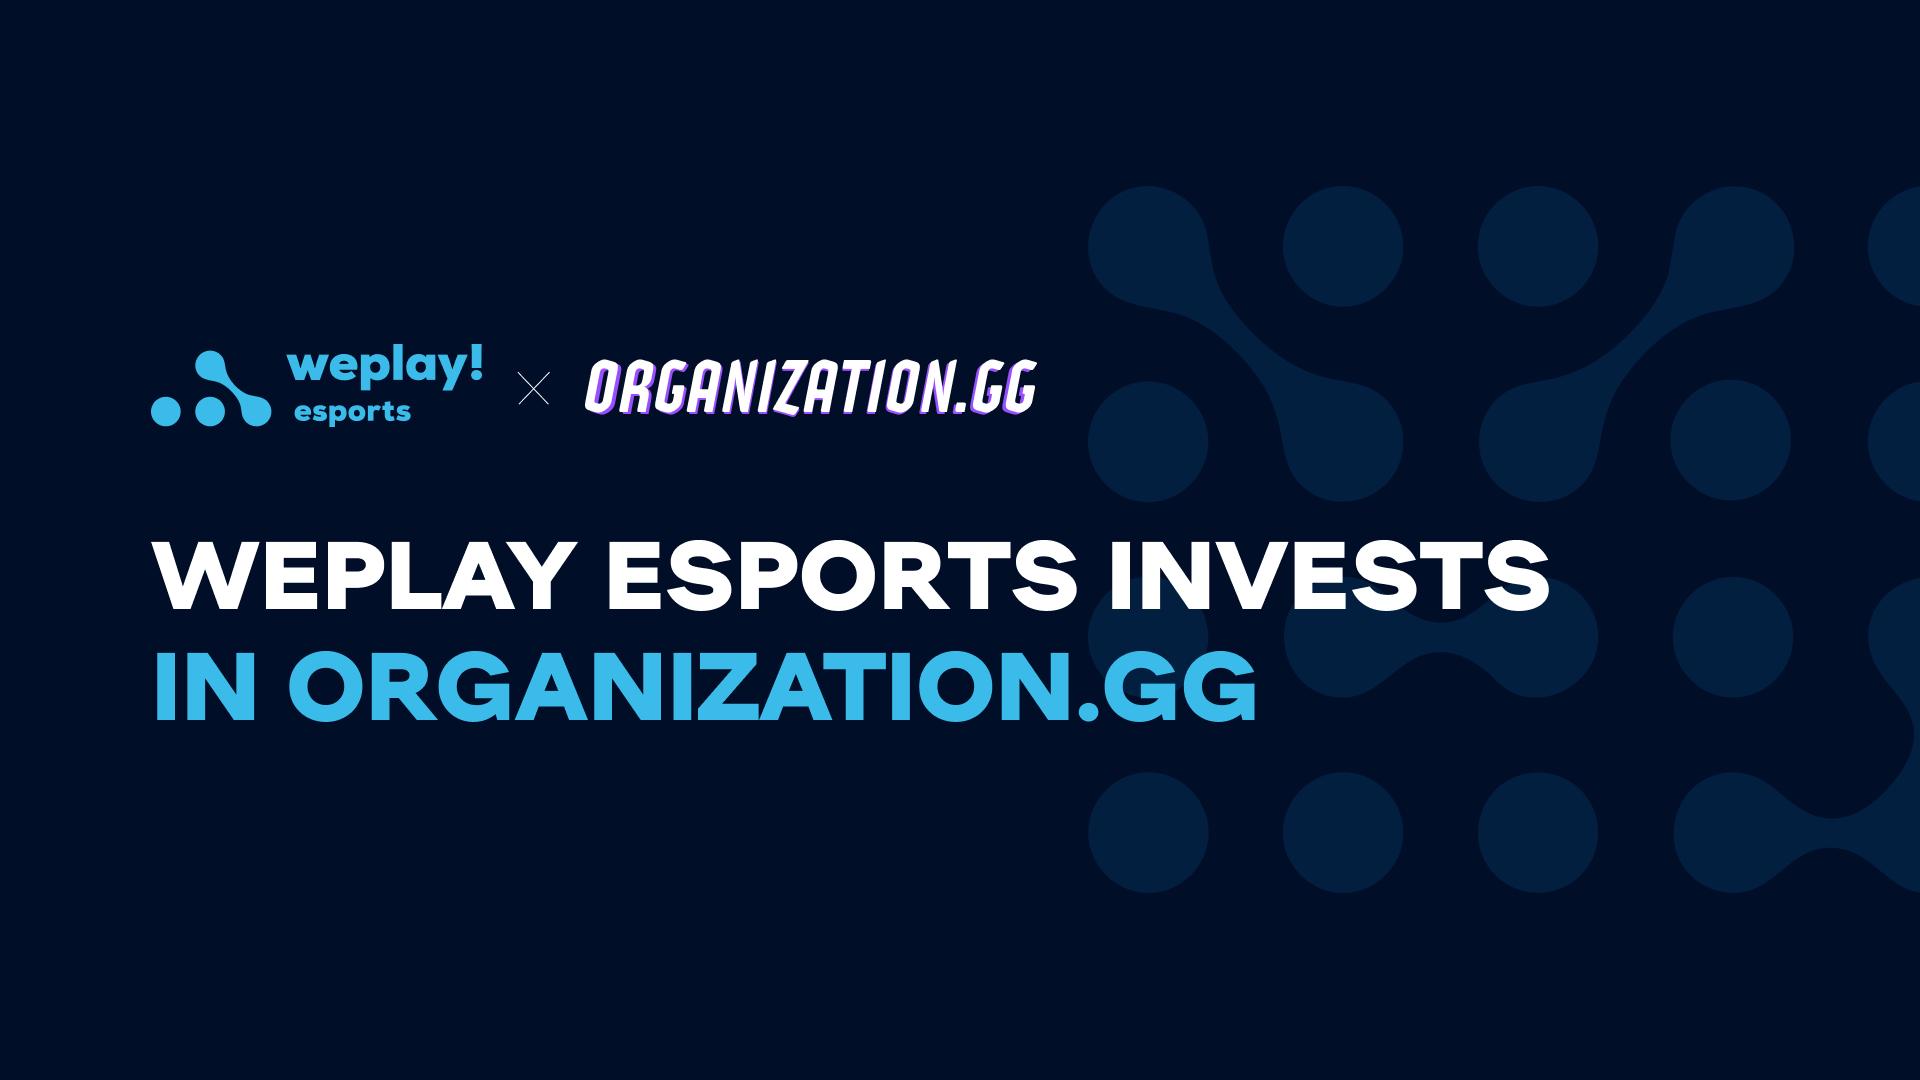 Weplay! Esports Organization.GG